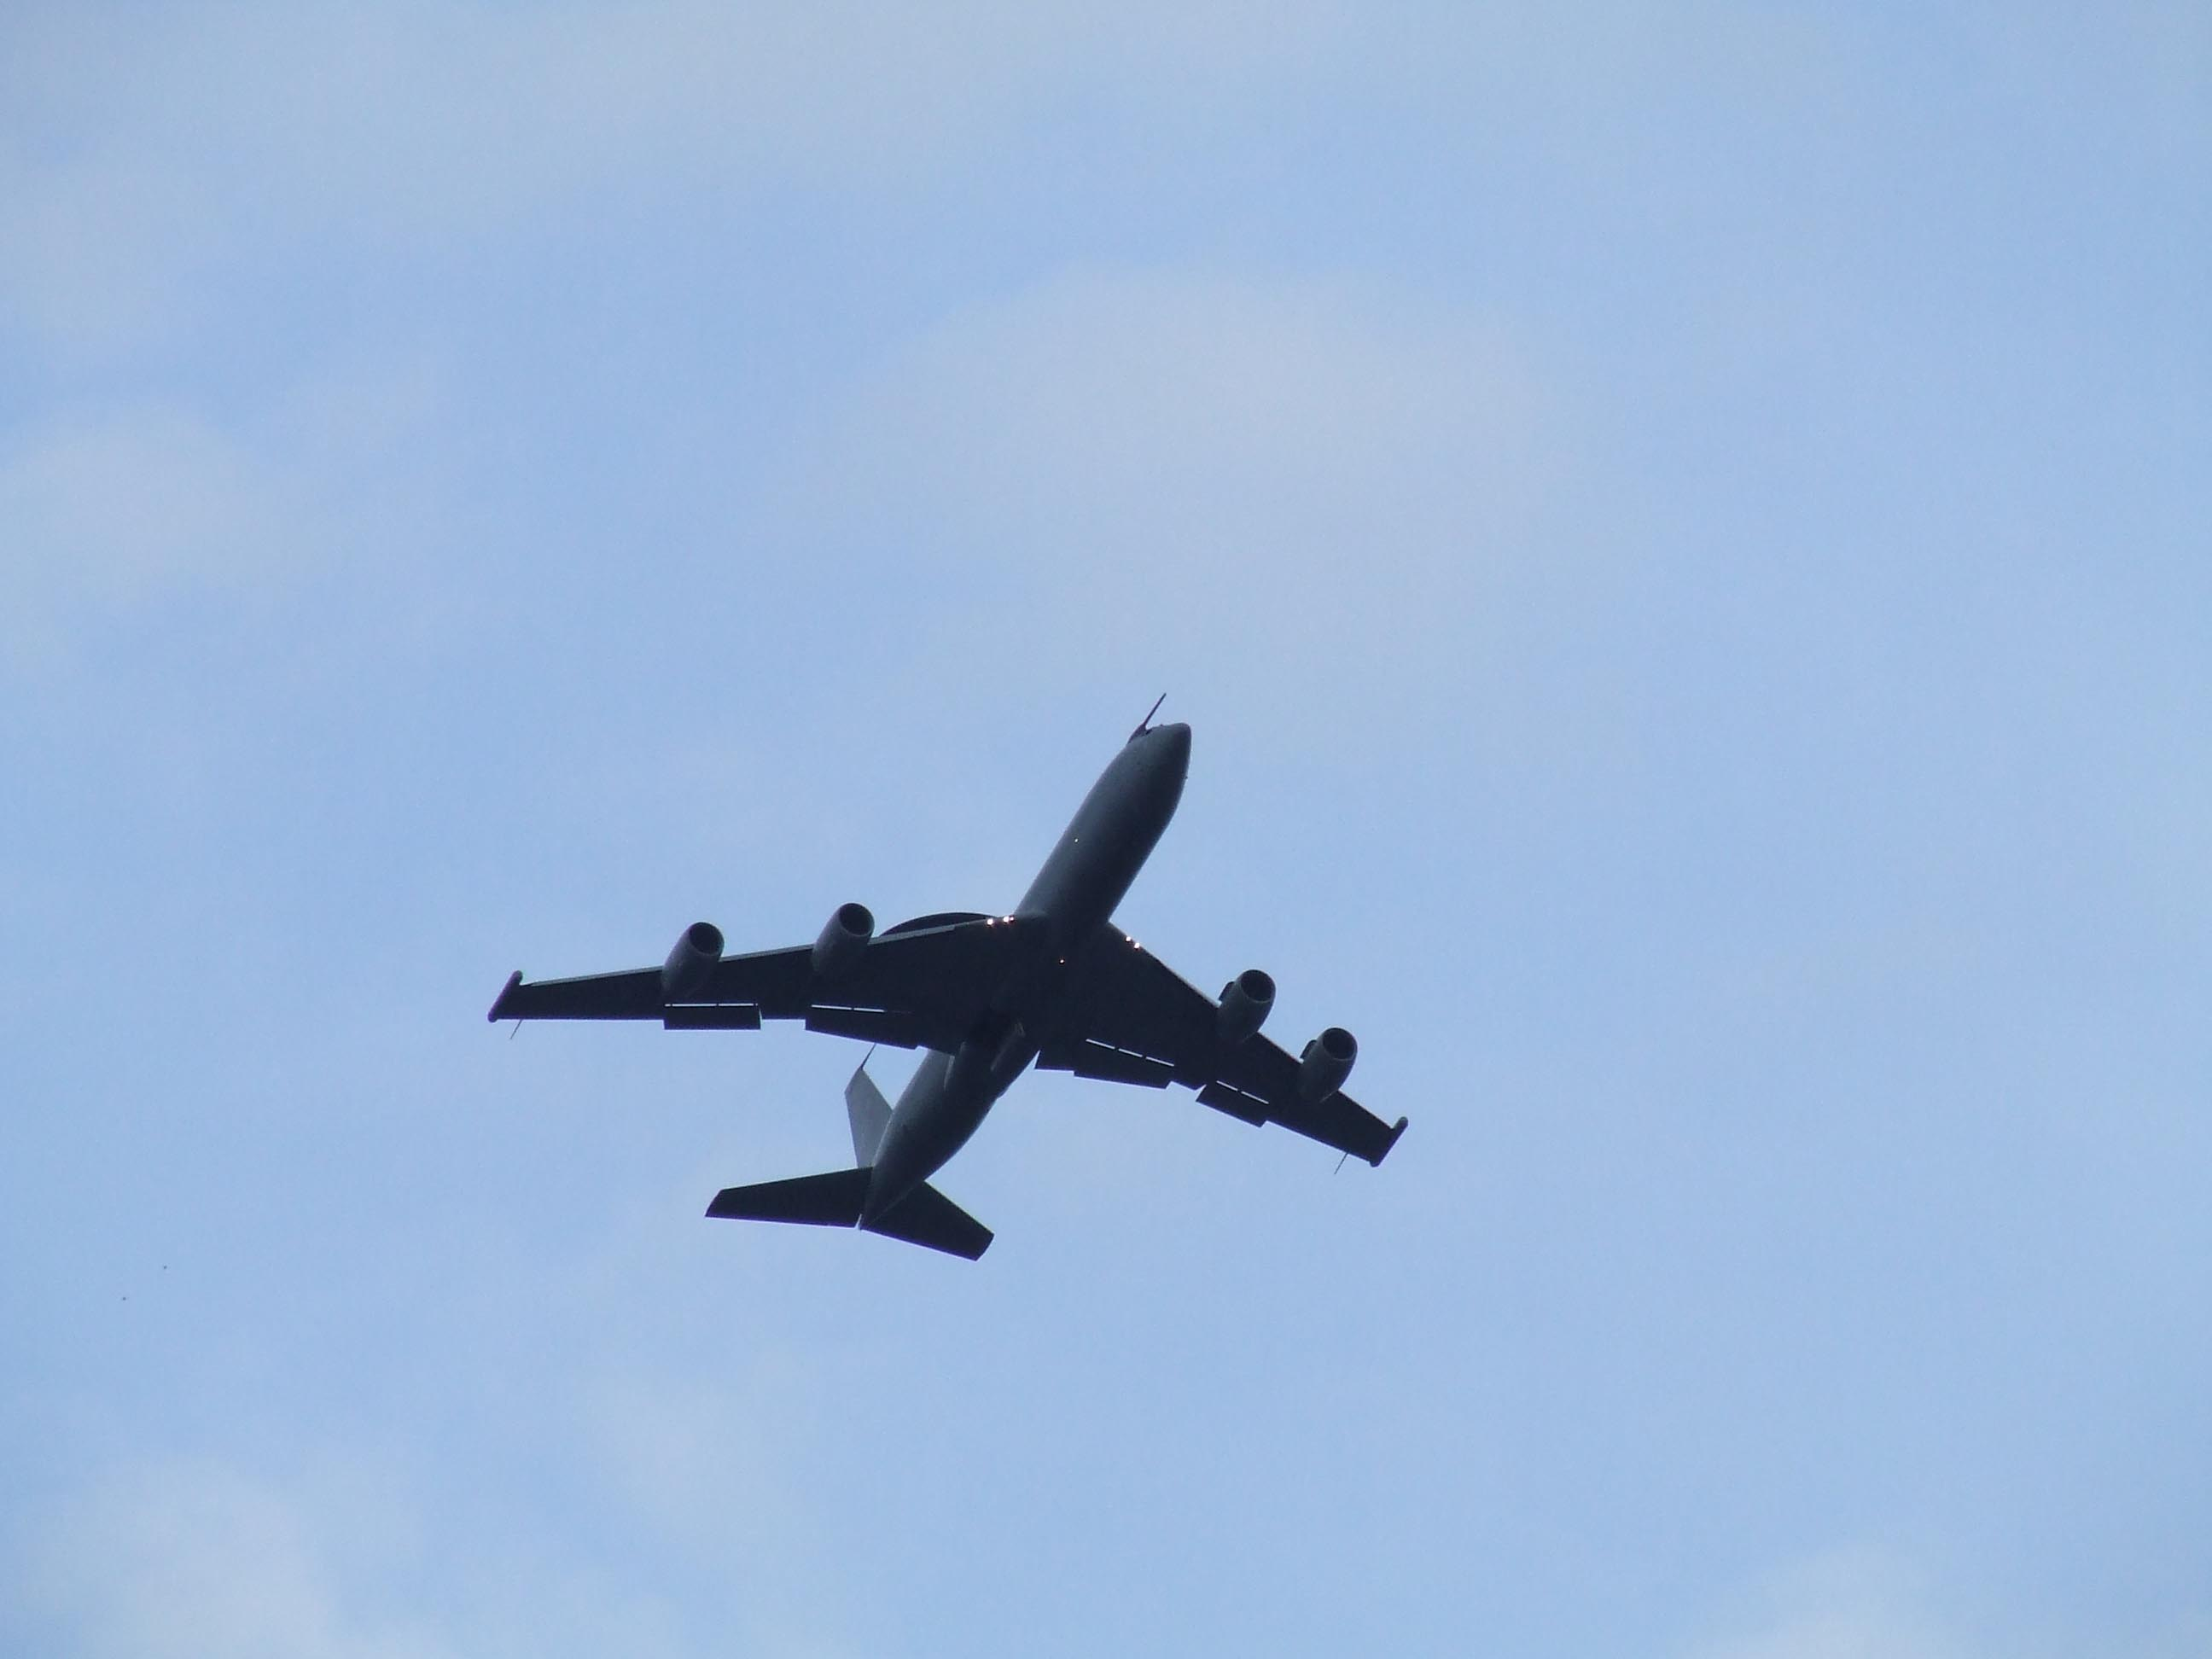 sombra avión 3